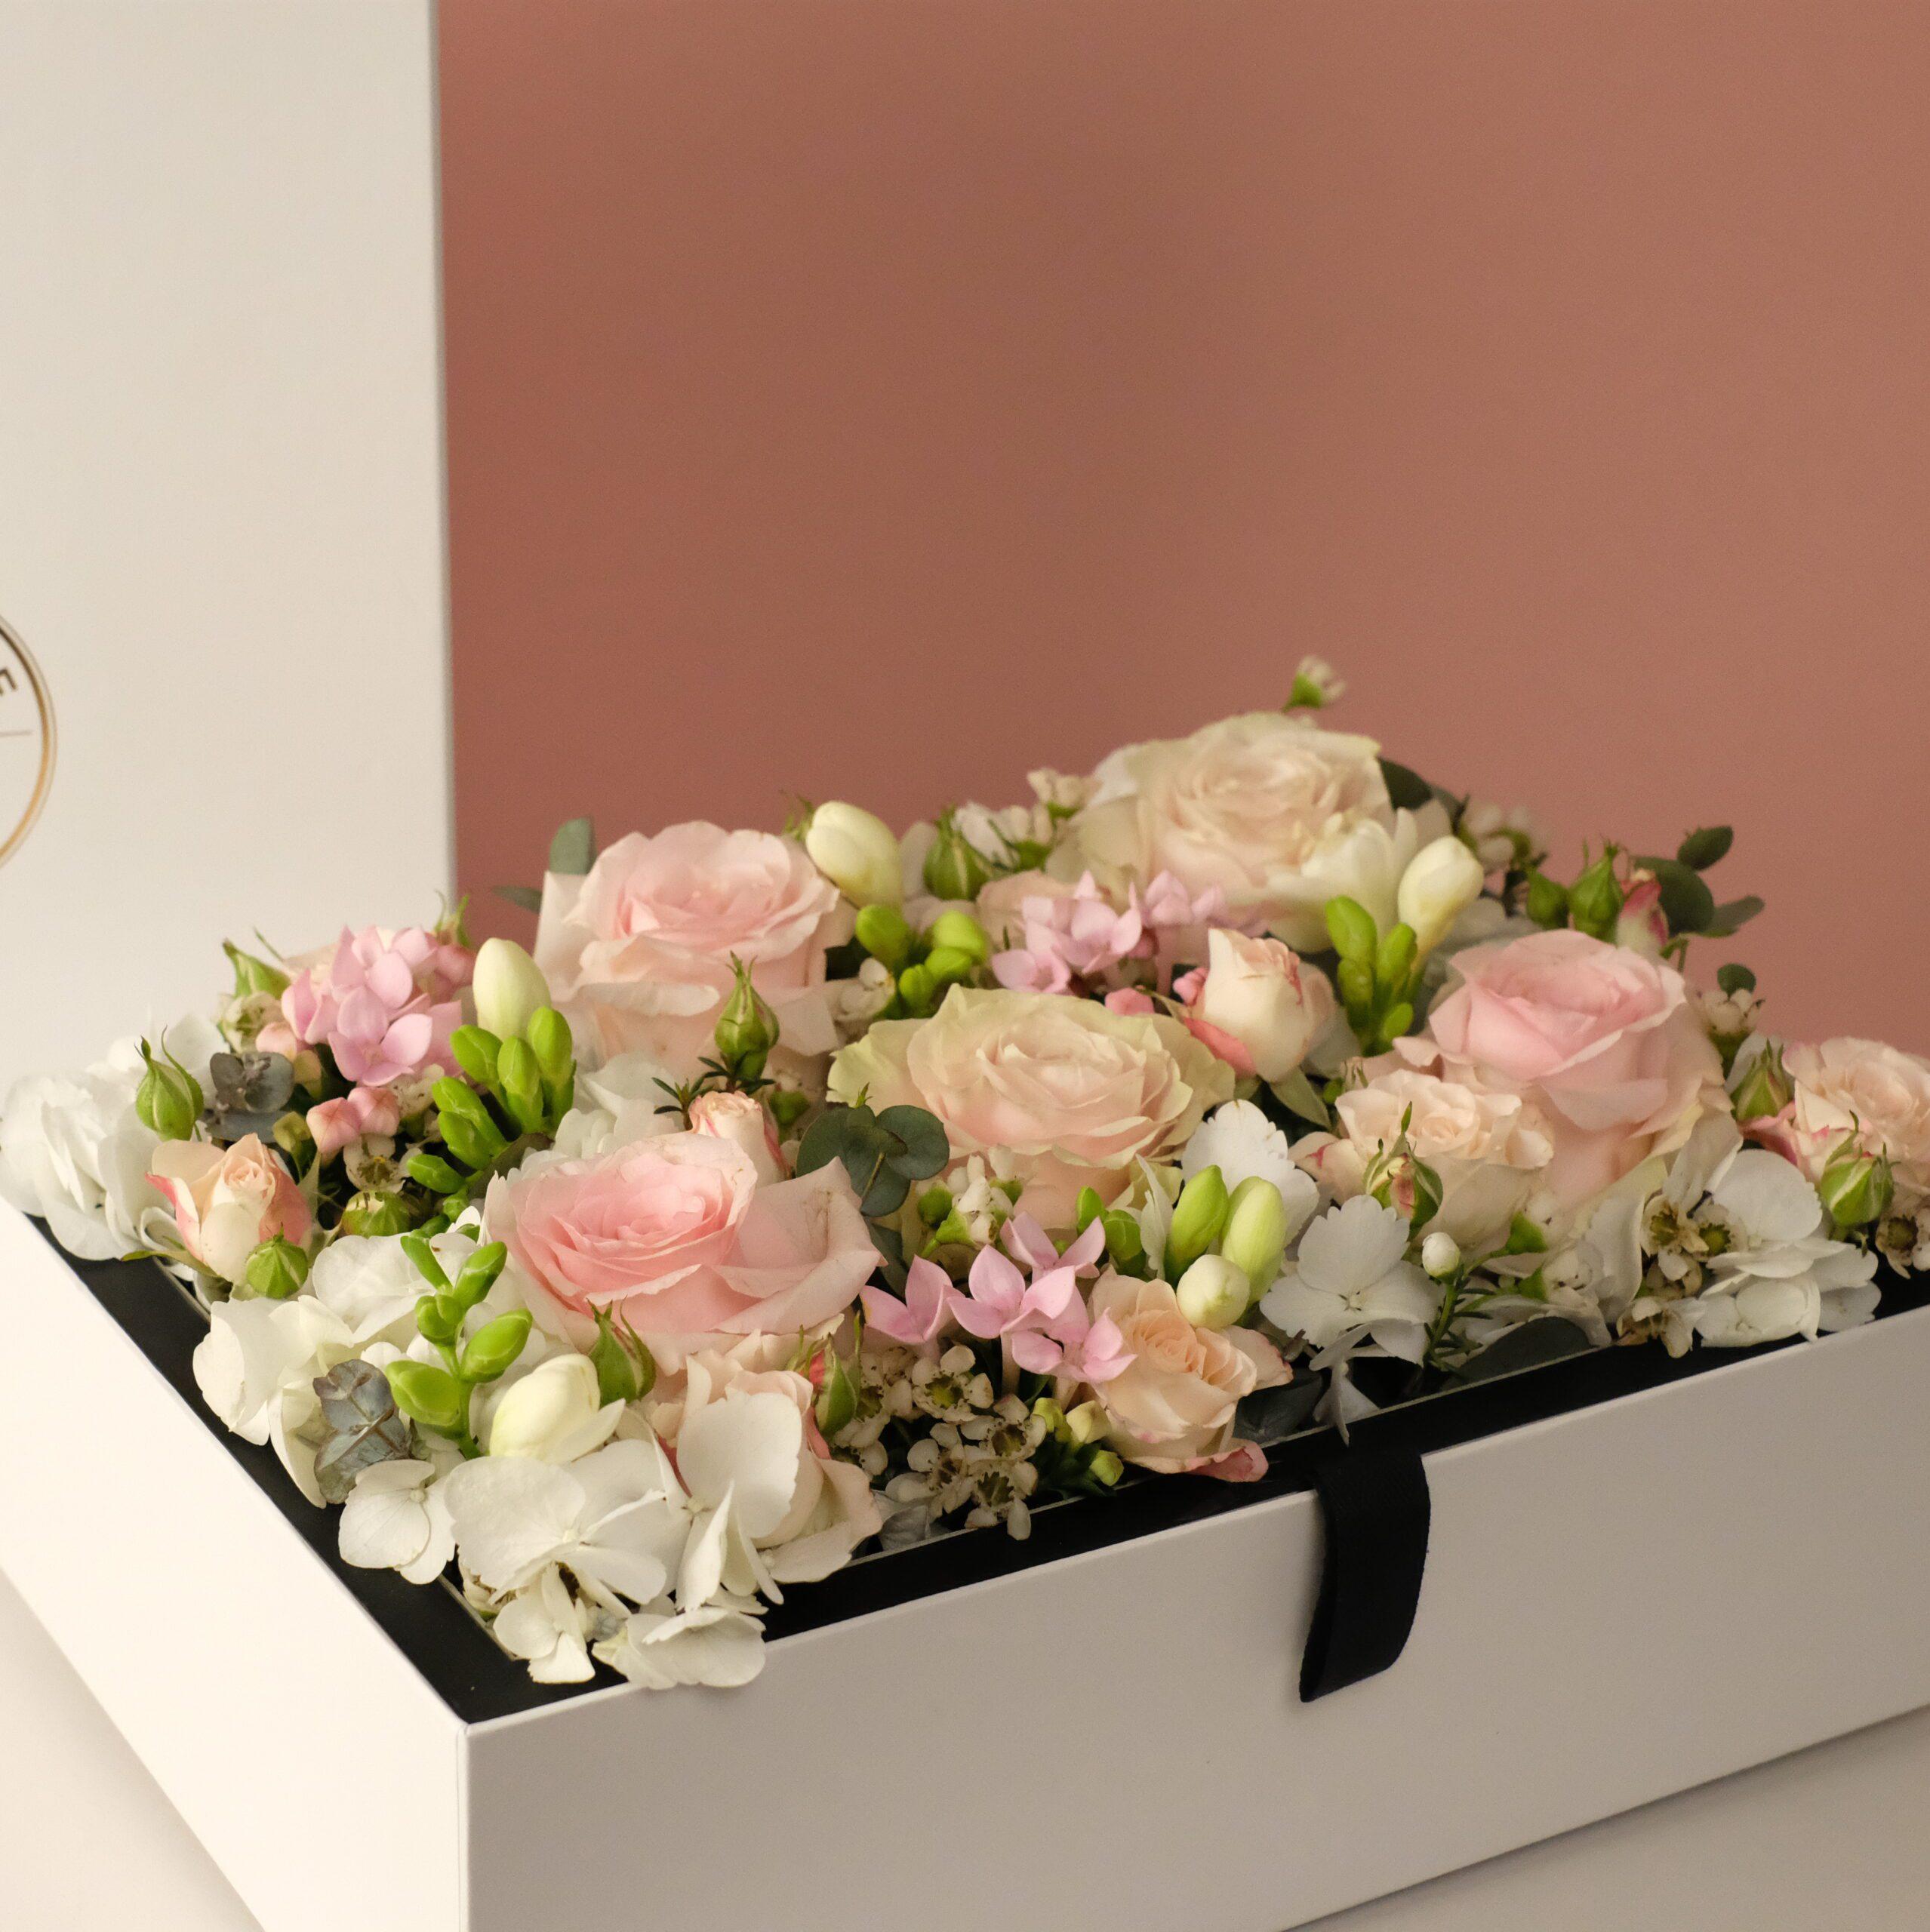 coffret-fleurs-rectangle-tendresse-atelier-lavarenne-fleuriste-lyon